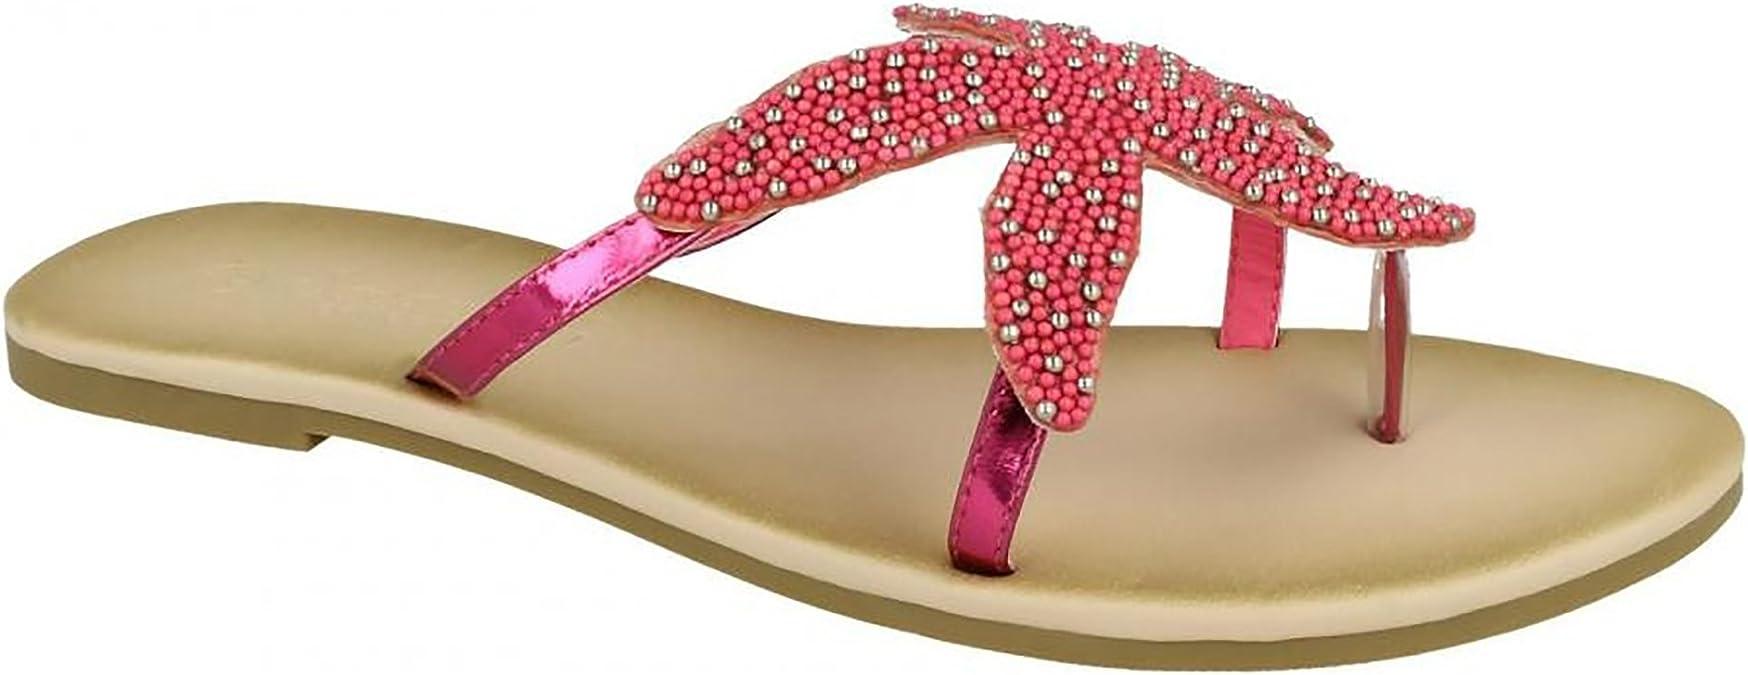 Savannah Beaded Toe Post Ladies Sandals